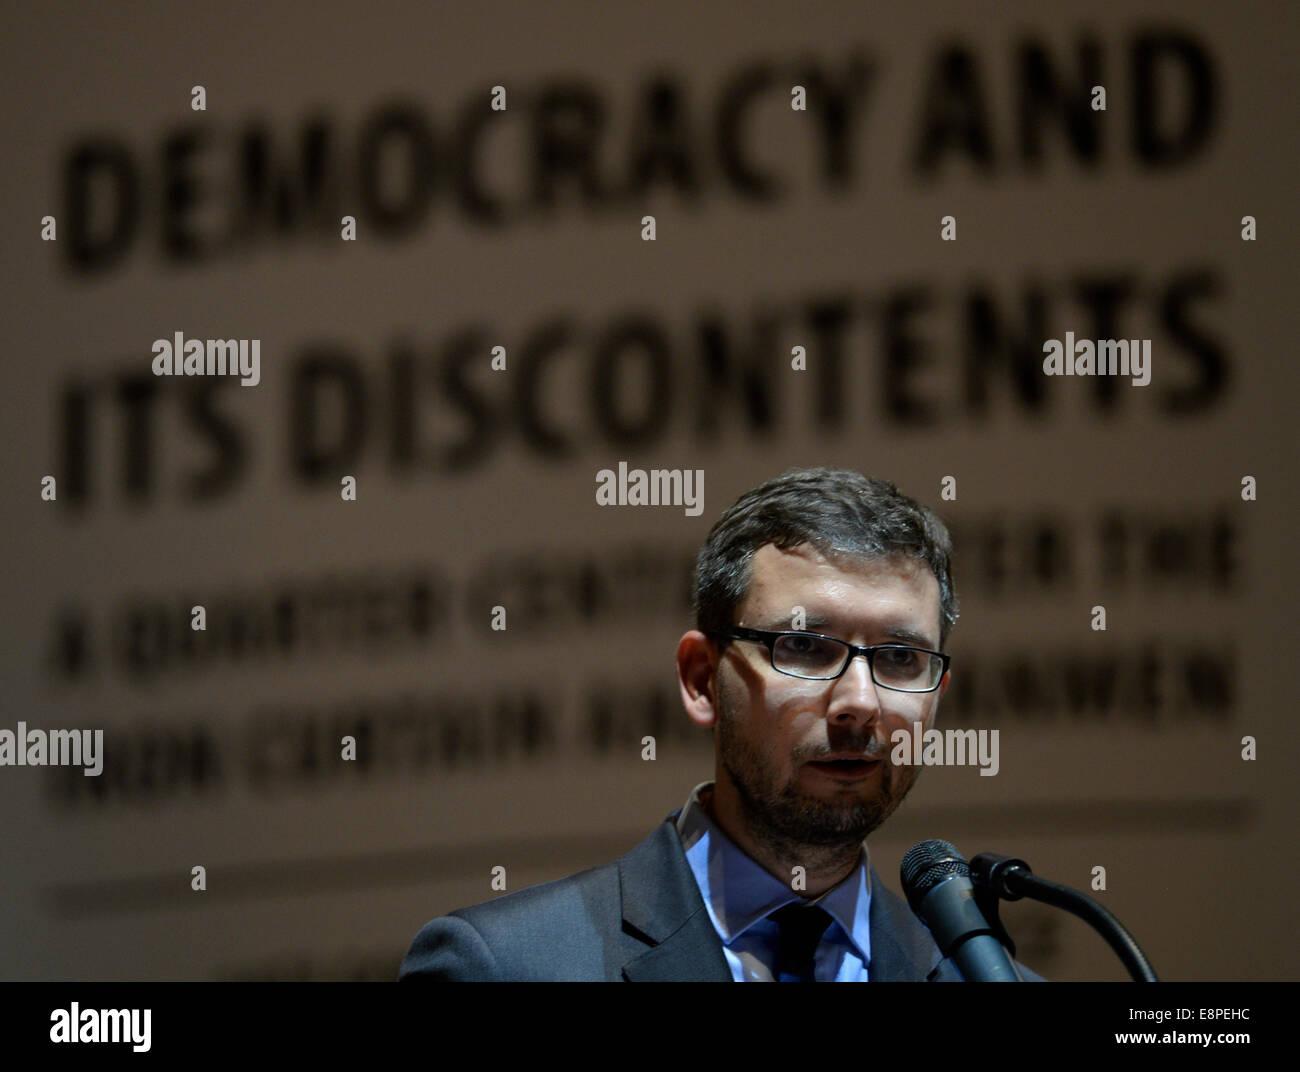 Prague, Czech Republic. 12th Oct, 2014. Executive Director of the Forum 2000 Foundation Jakub Klepal speaks during Stock Photo